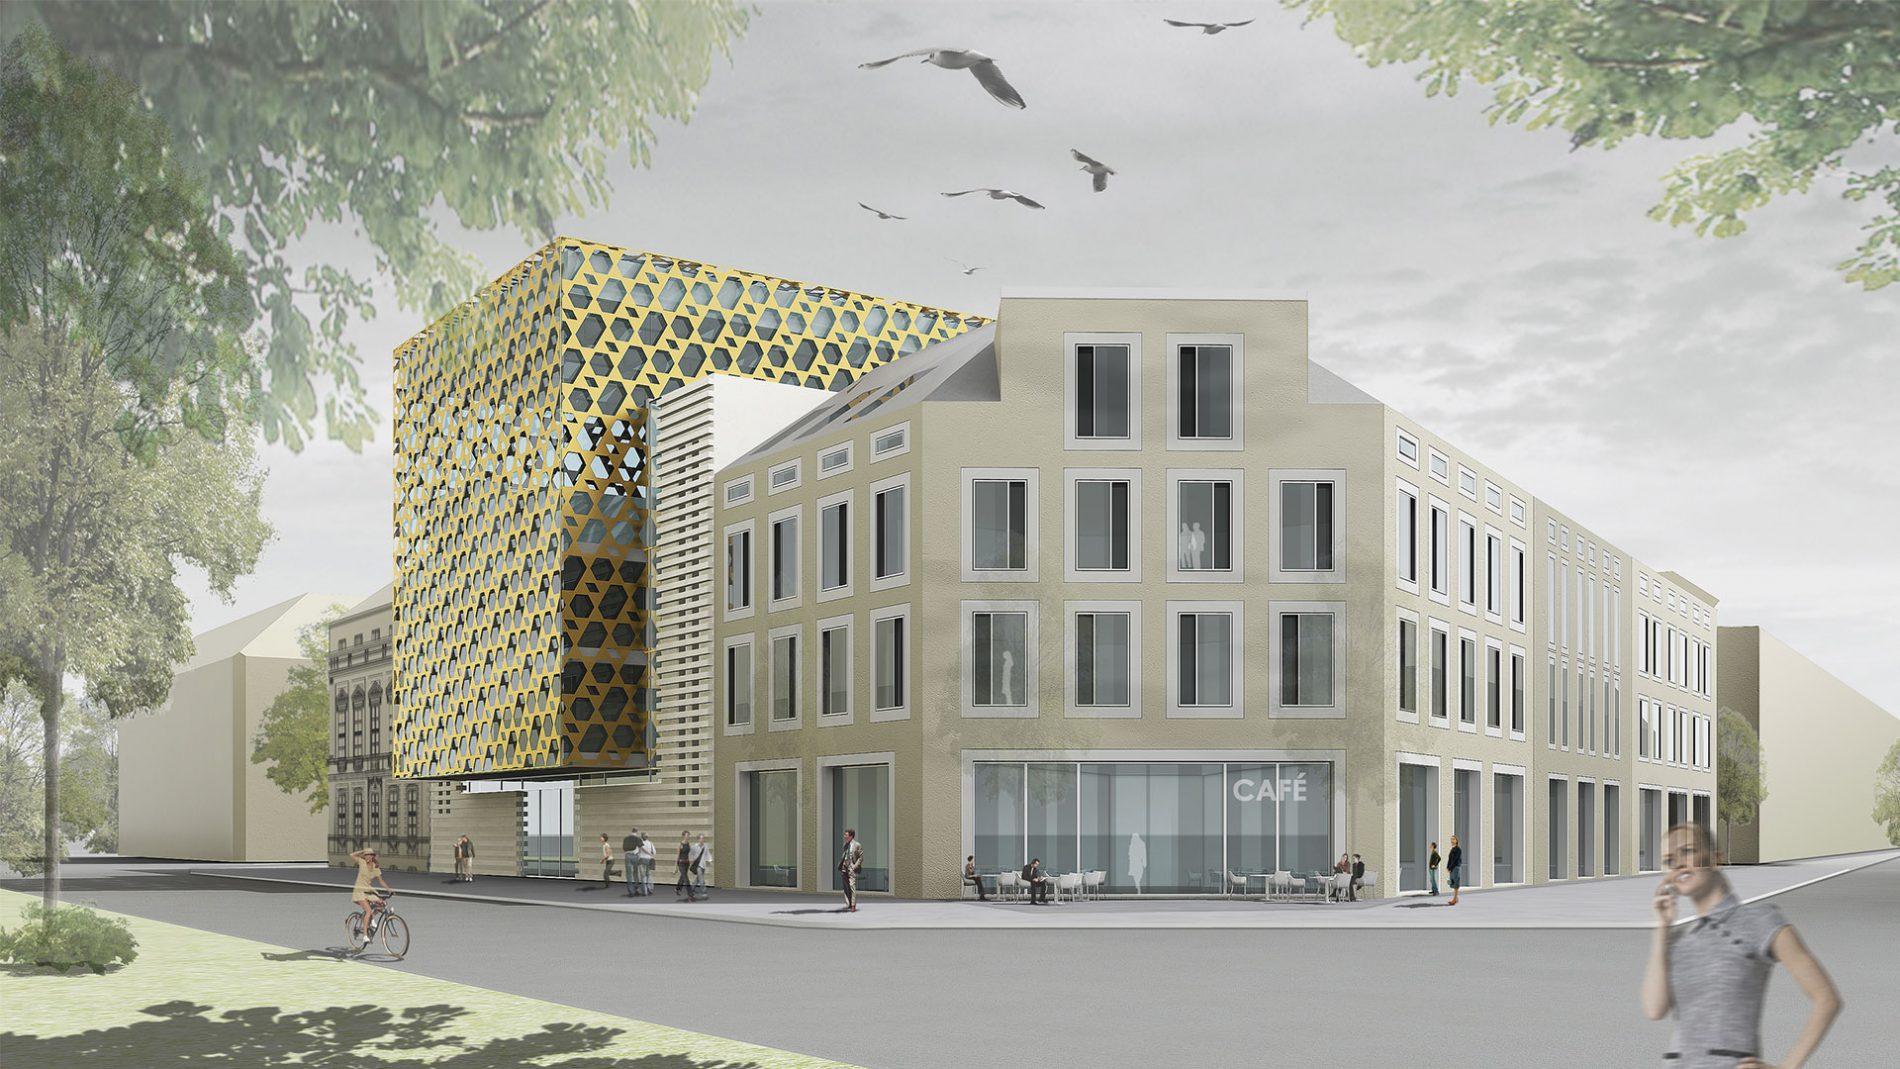 Ksv neue synagoge potsdam for Design hotel quedlinburg